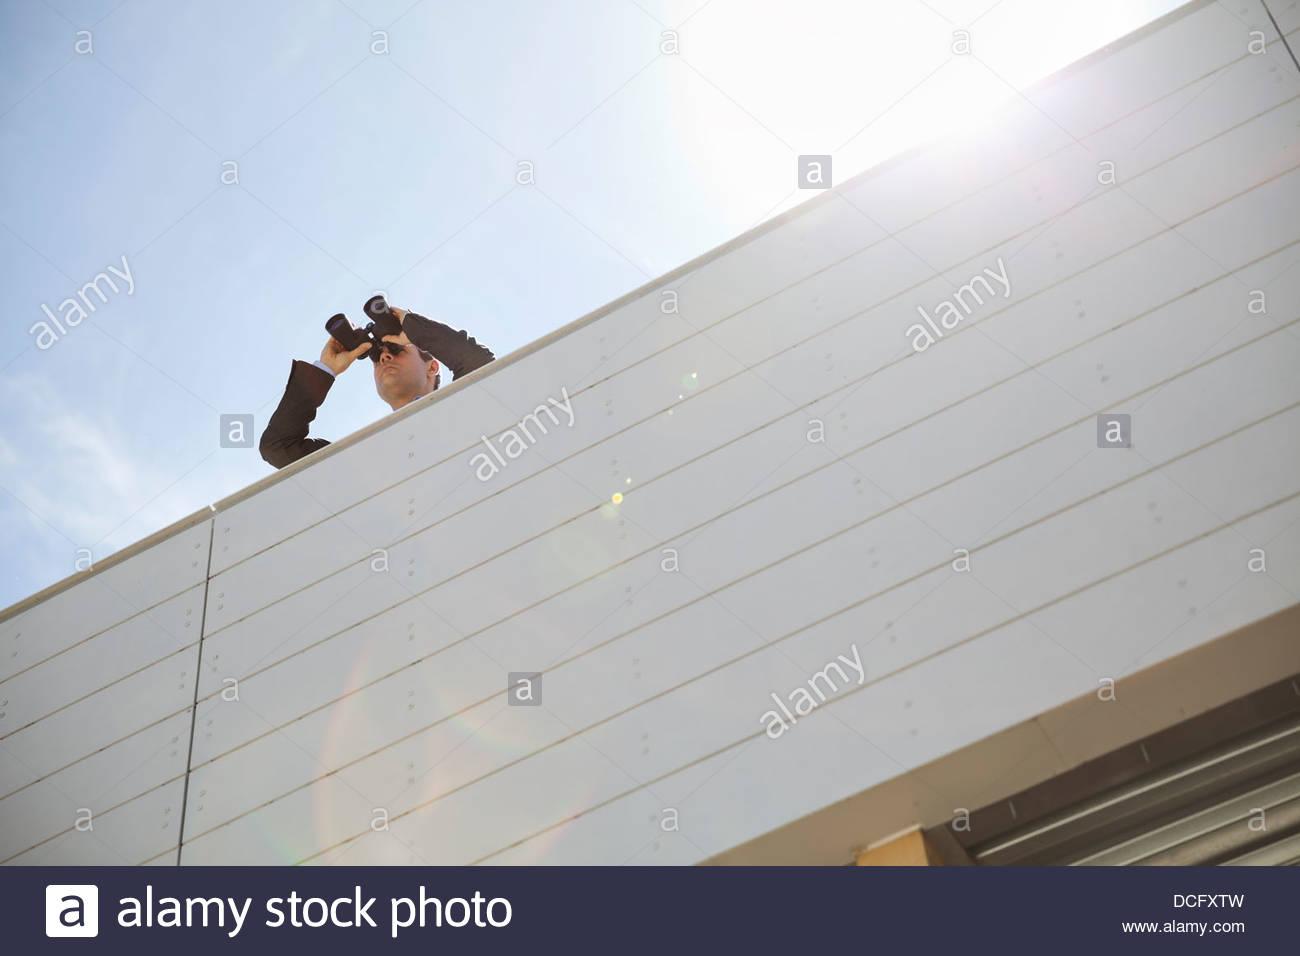 Businessman looking through binoculars on rooftop - Stock Image